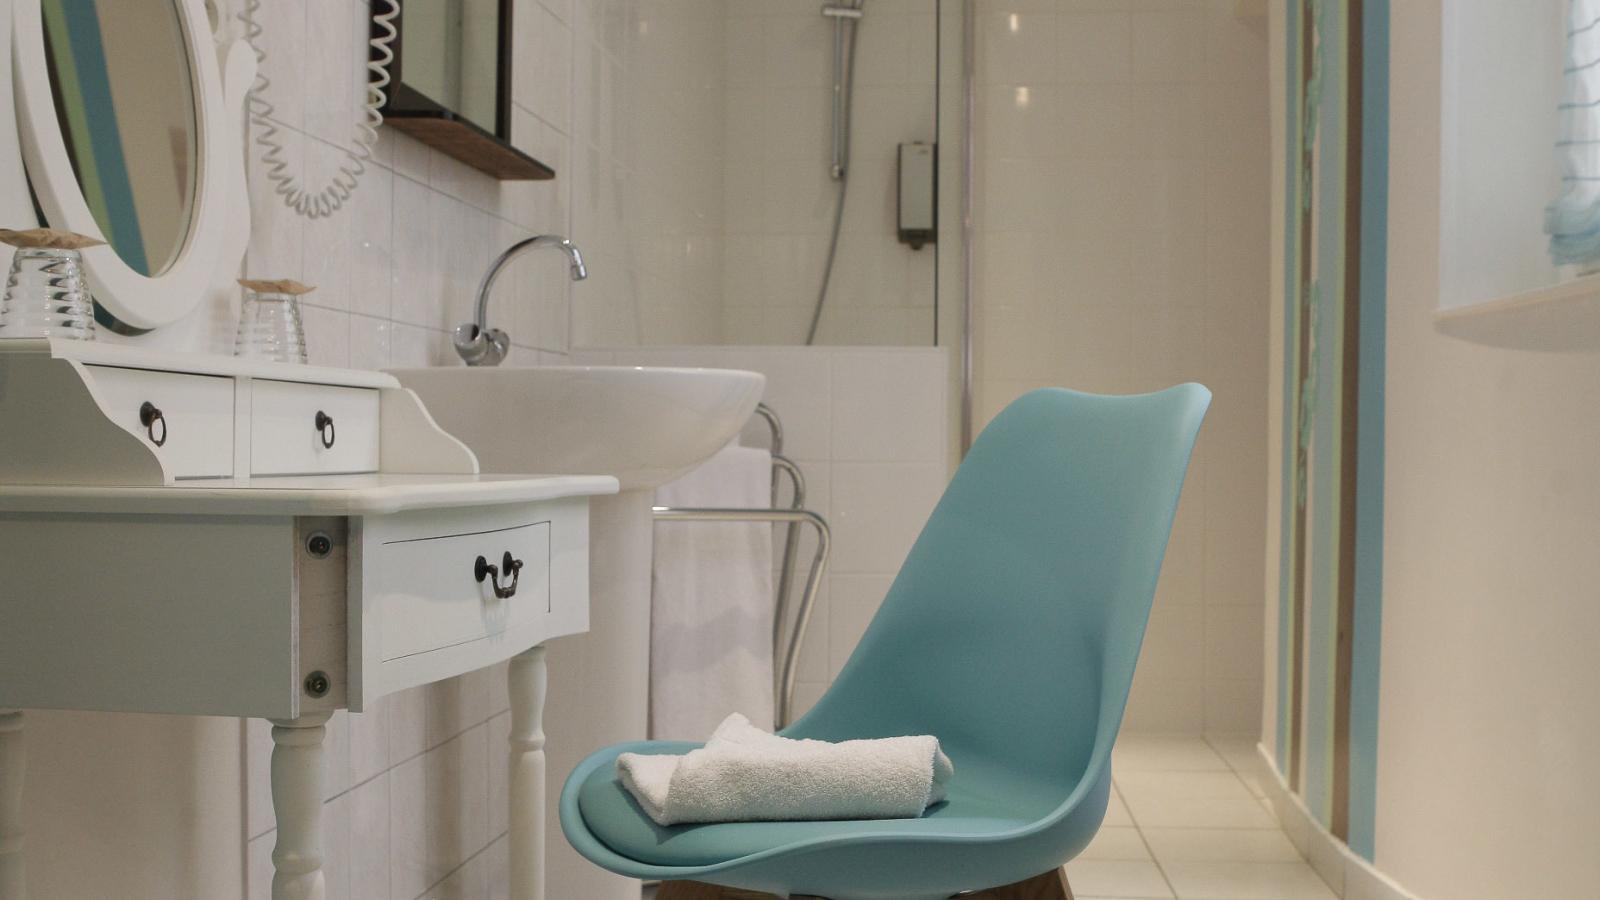 Hôtel Bayard-Bellecour - Bathroom